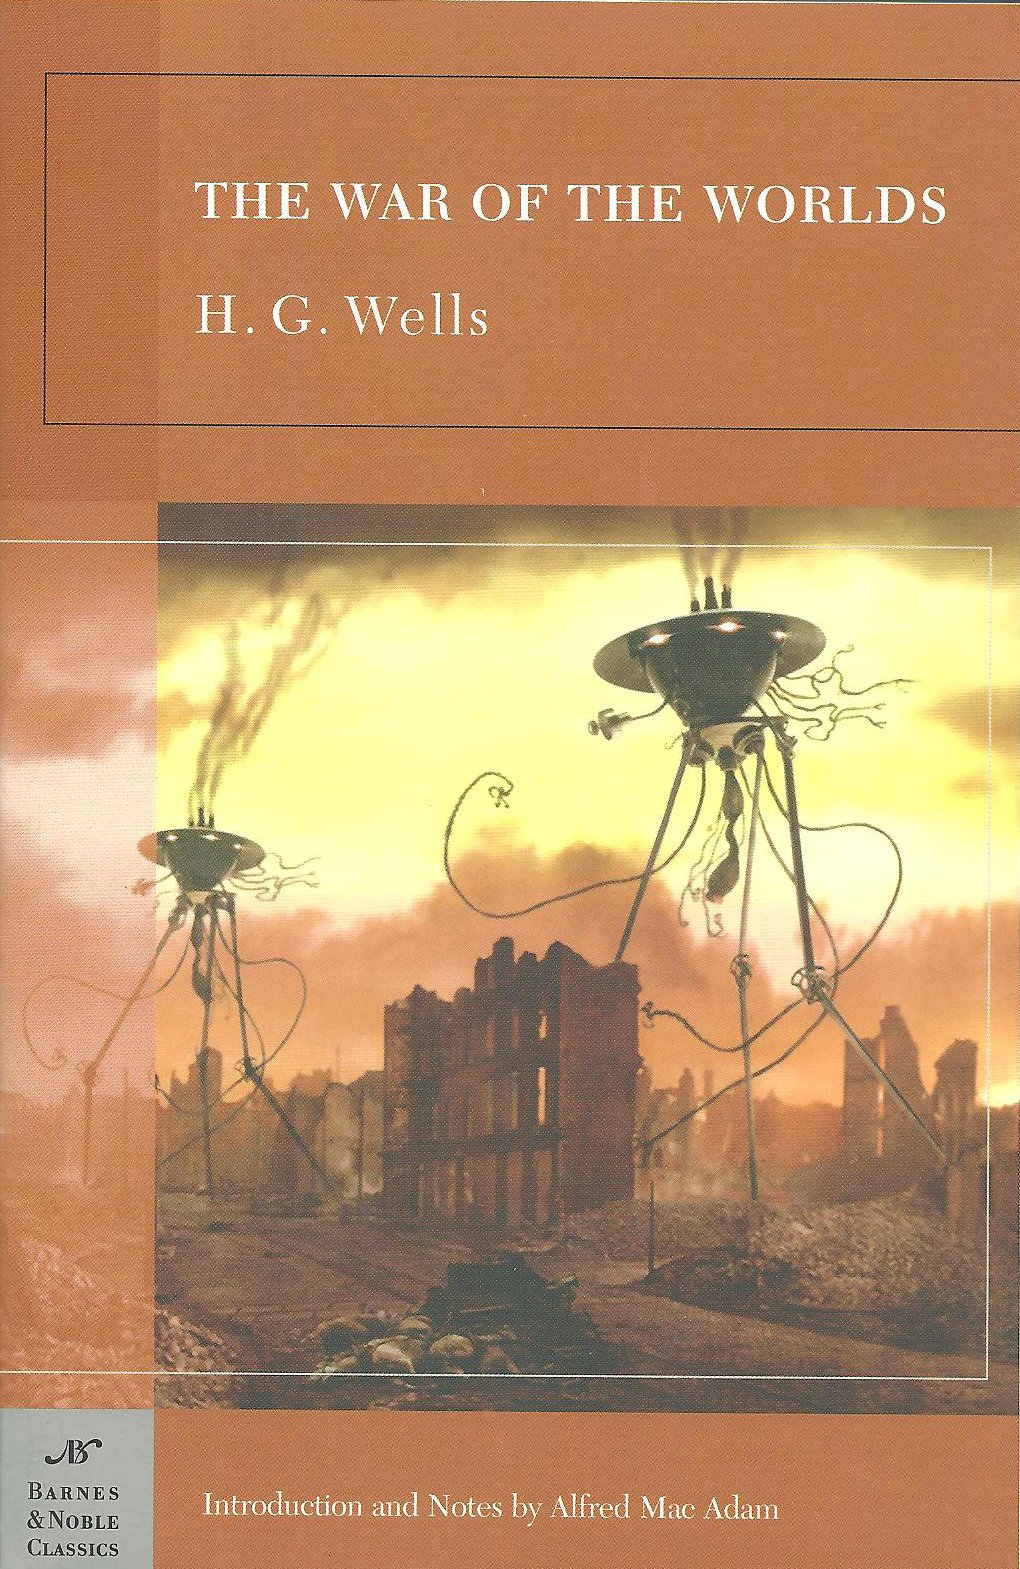 hg wells war of the worlds book report